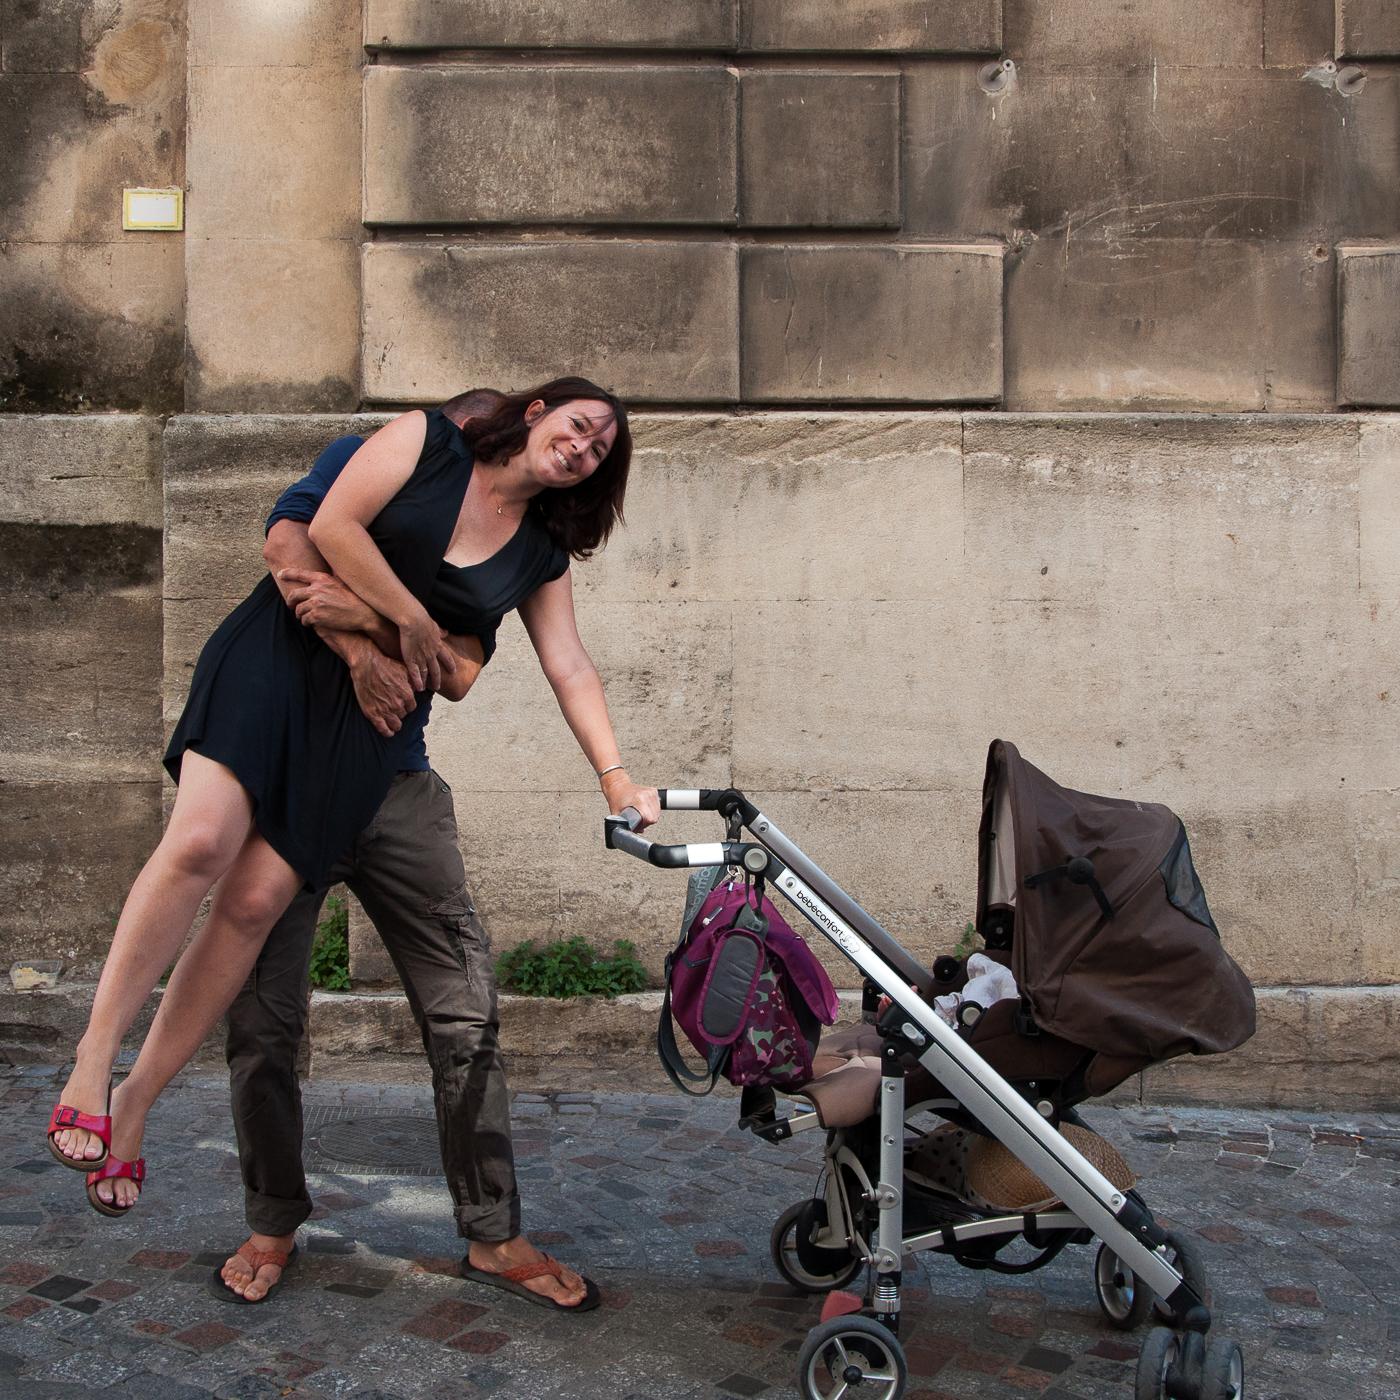 Arles 2015 - La pousette